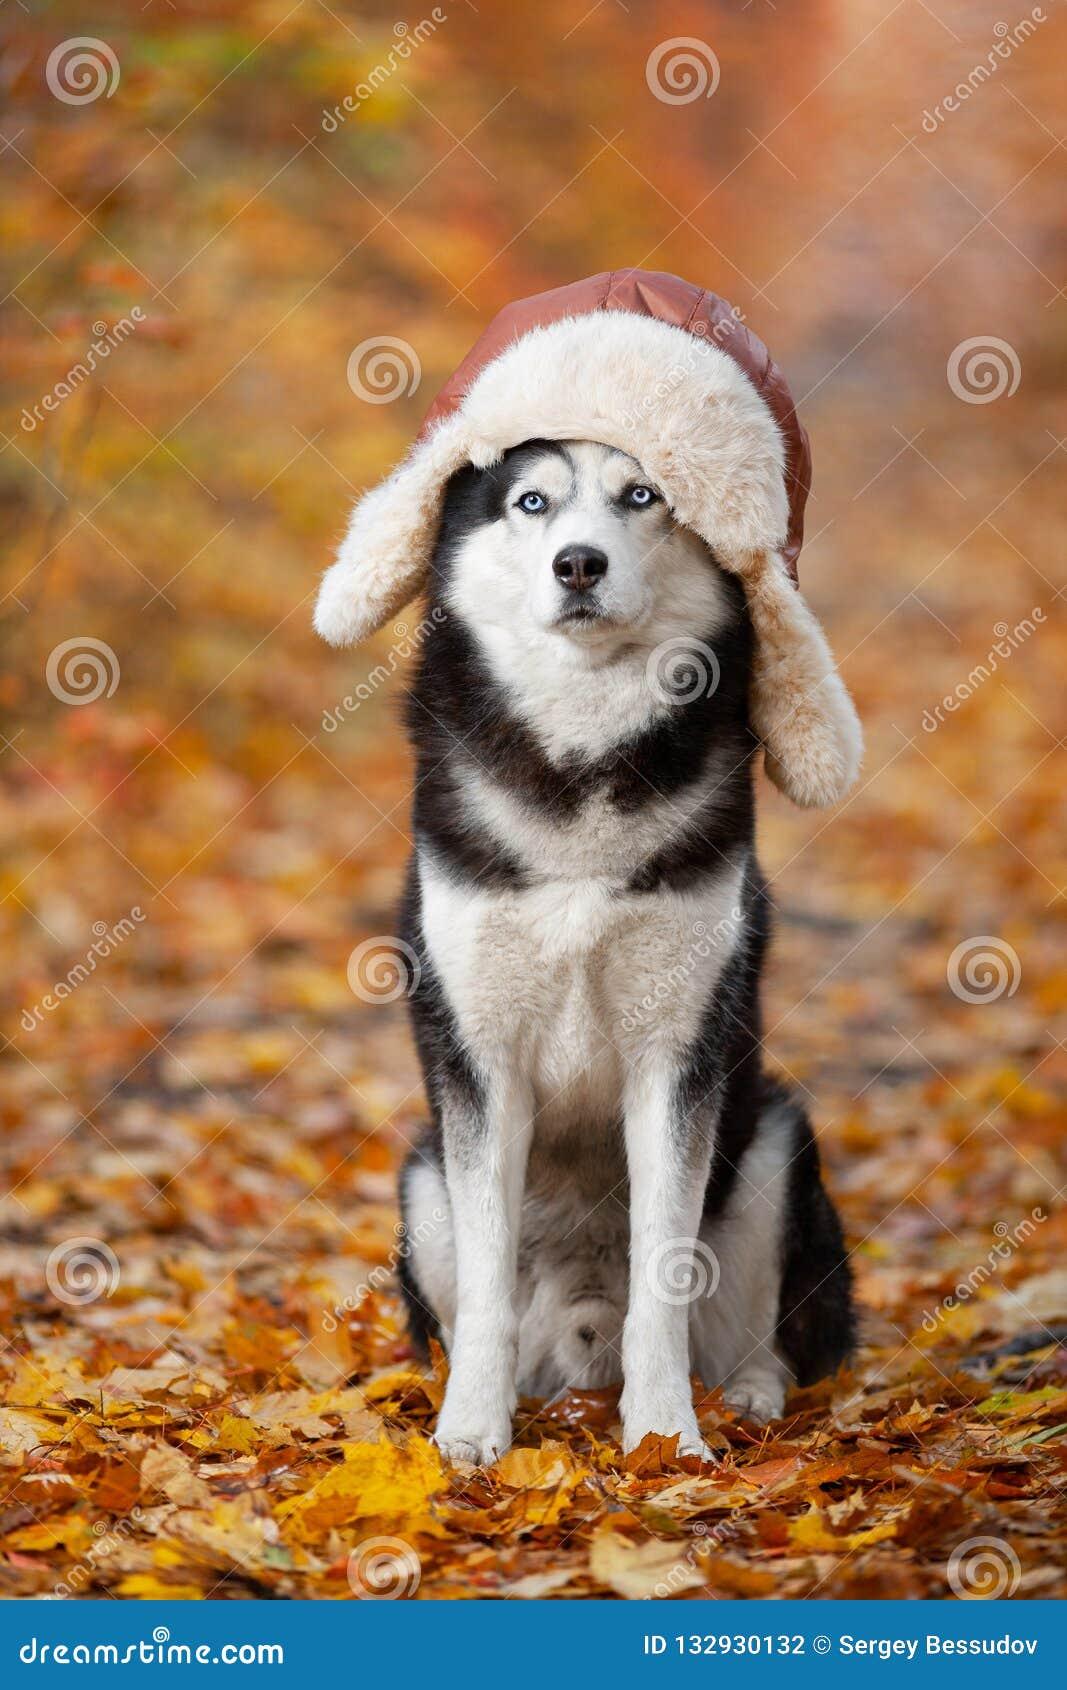 Svartvit Siberian skrovlig hund i en hatt med earflaps som sitter i gula höstsidor